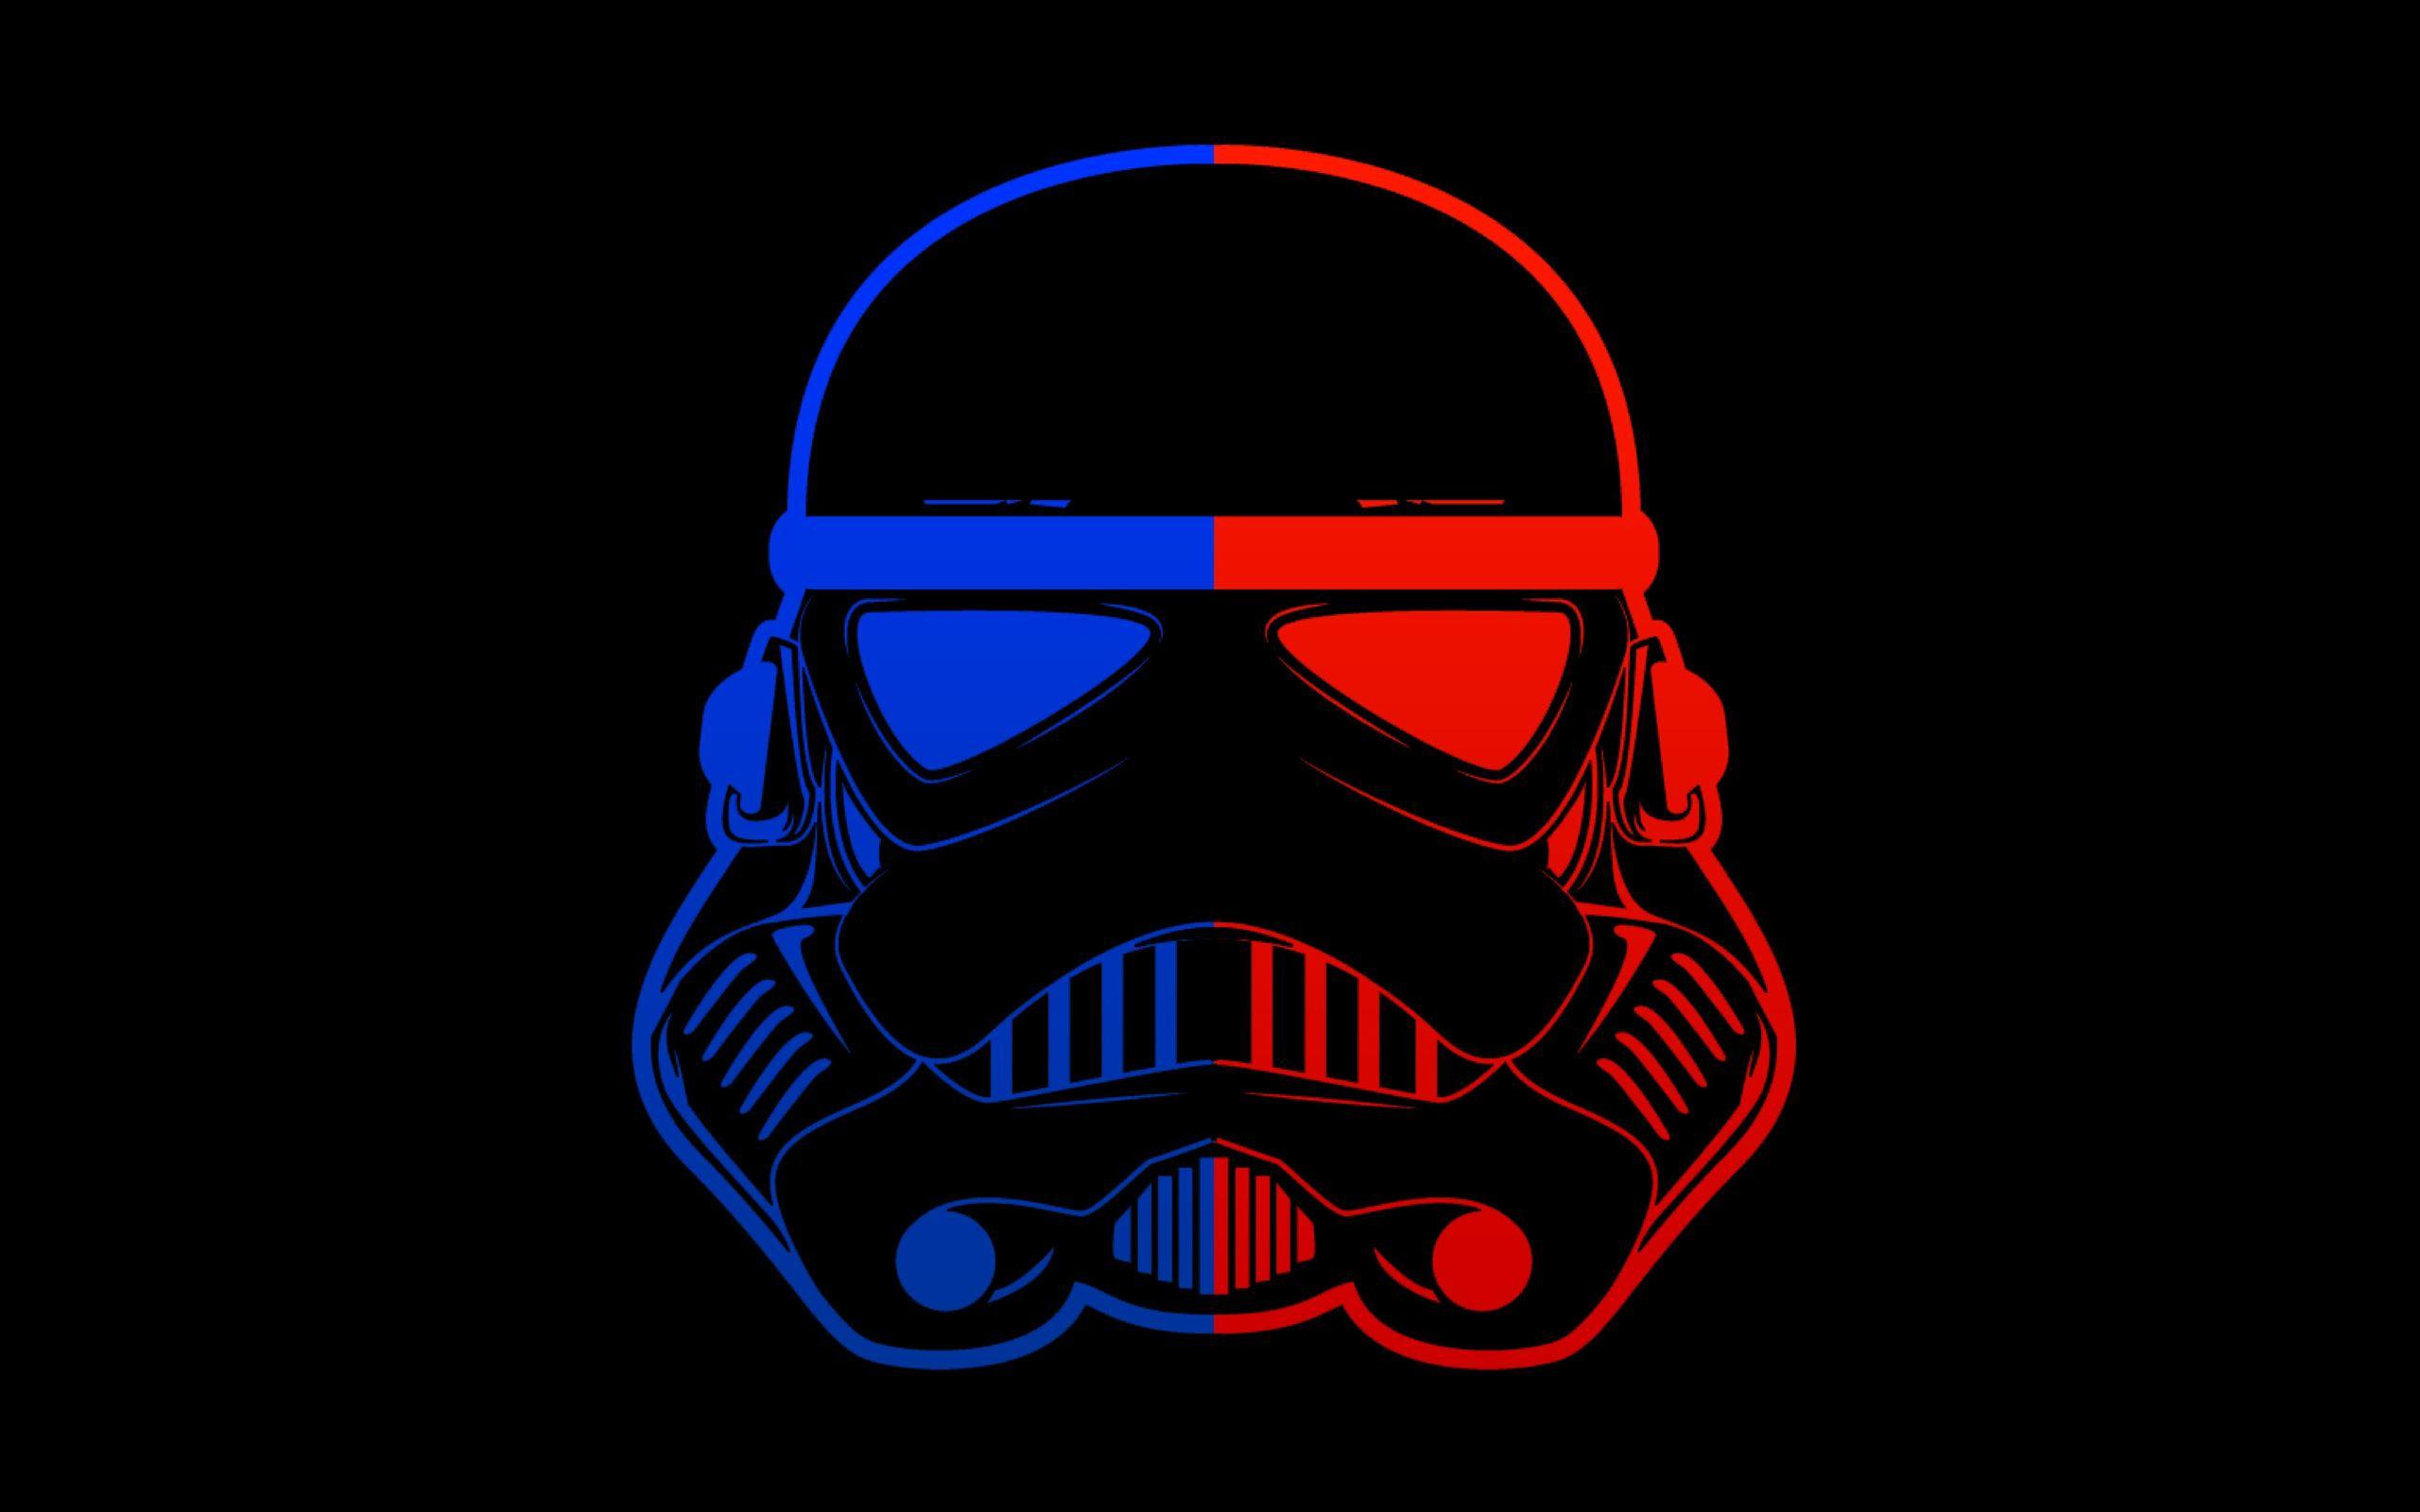 Stormtrooper Blue Red Mask Minimal 8k Macbook Air Wallpaper Download Allmacwallpaper